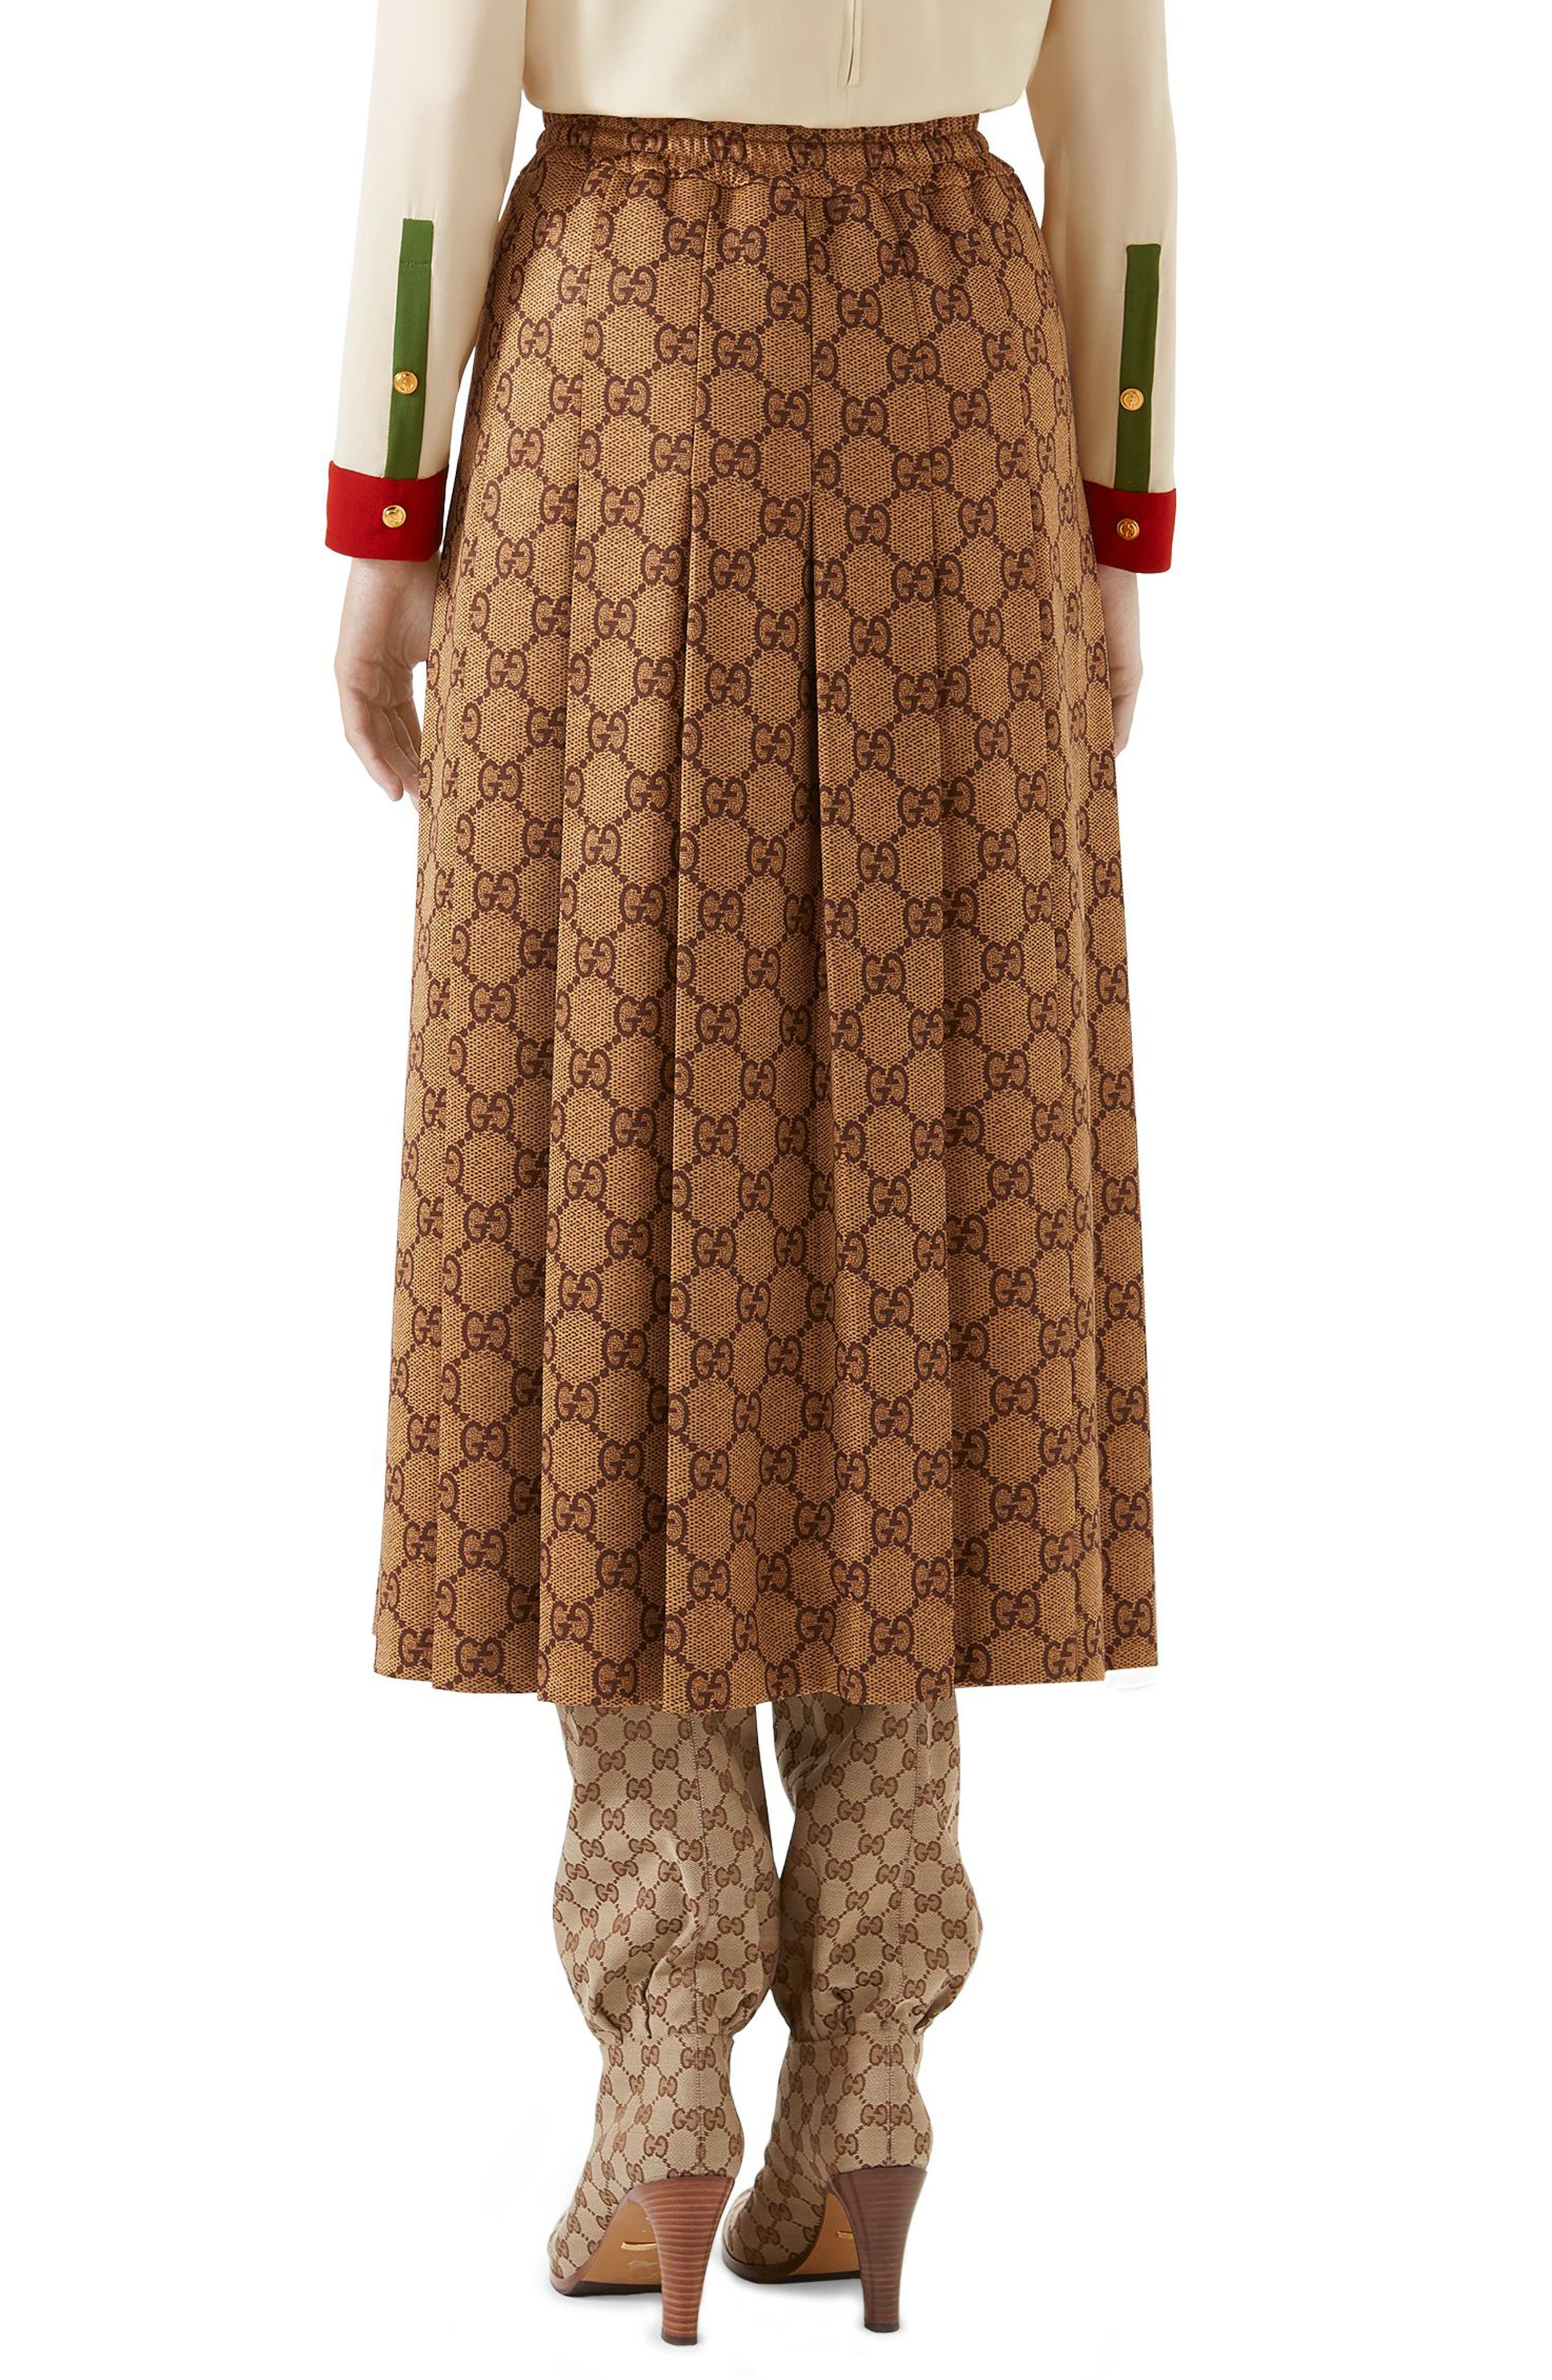 GG Print Pleated Midi Skirt,                             Alternate thumbnail 2, color,                             200